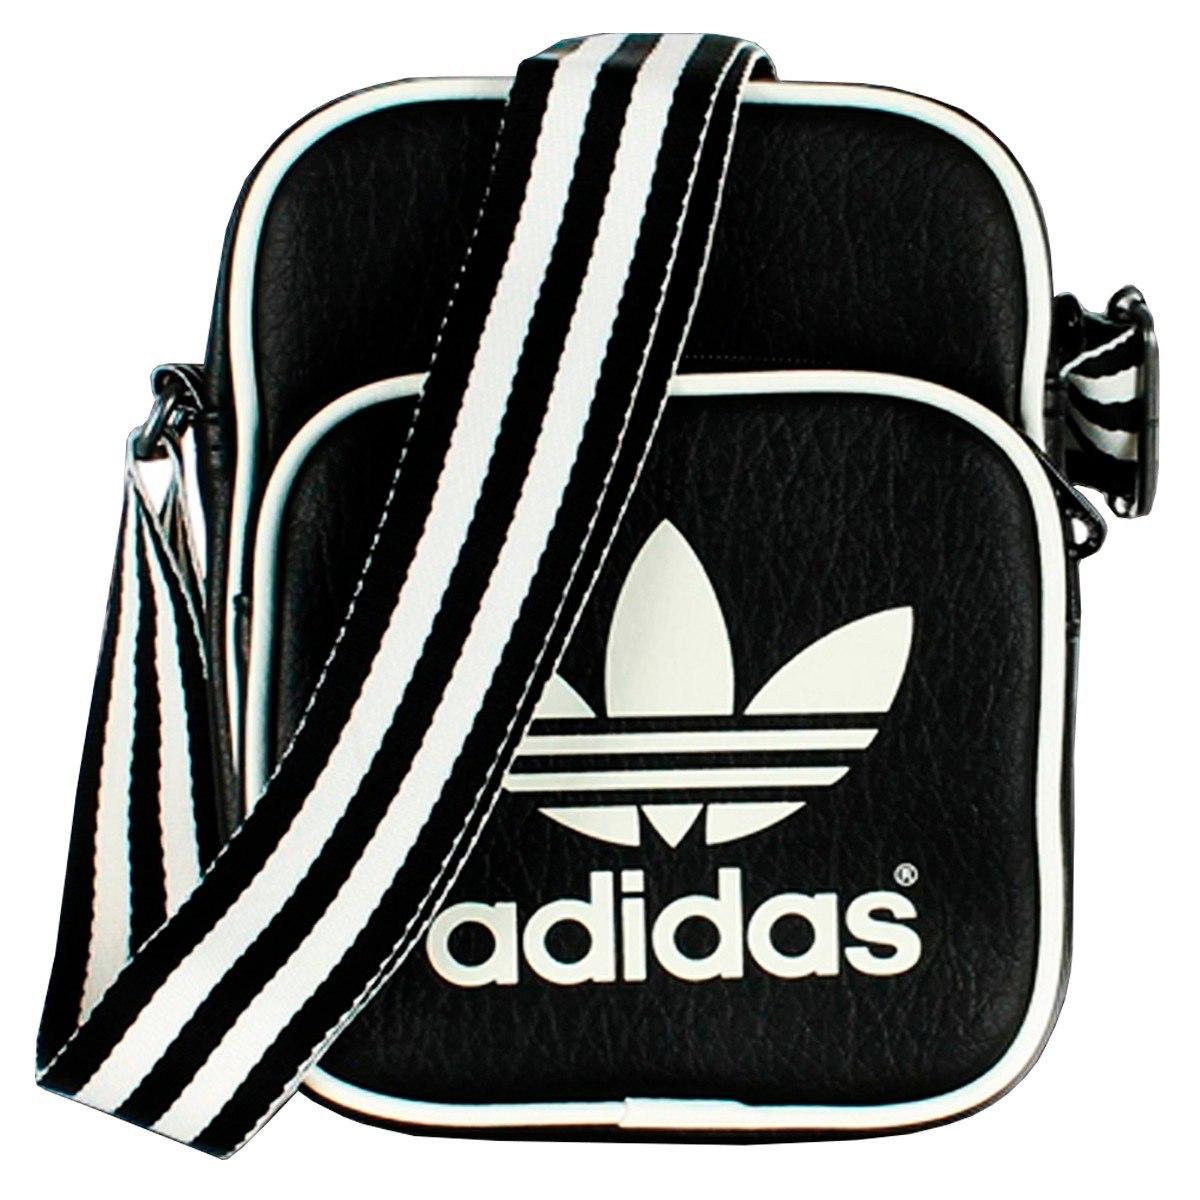 Adidas Mercadolibre Adidas Bolsos Hombre Bolsos 9IYWDHE2